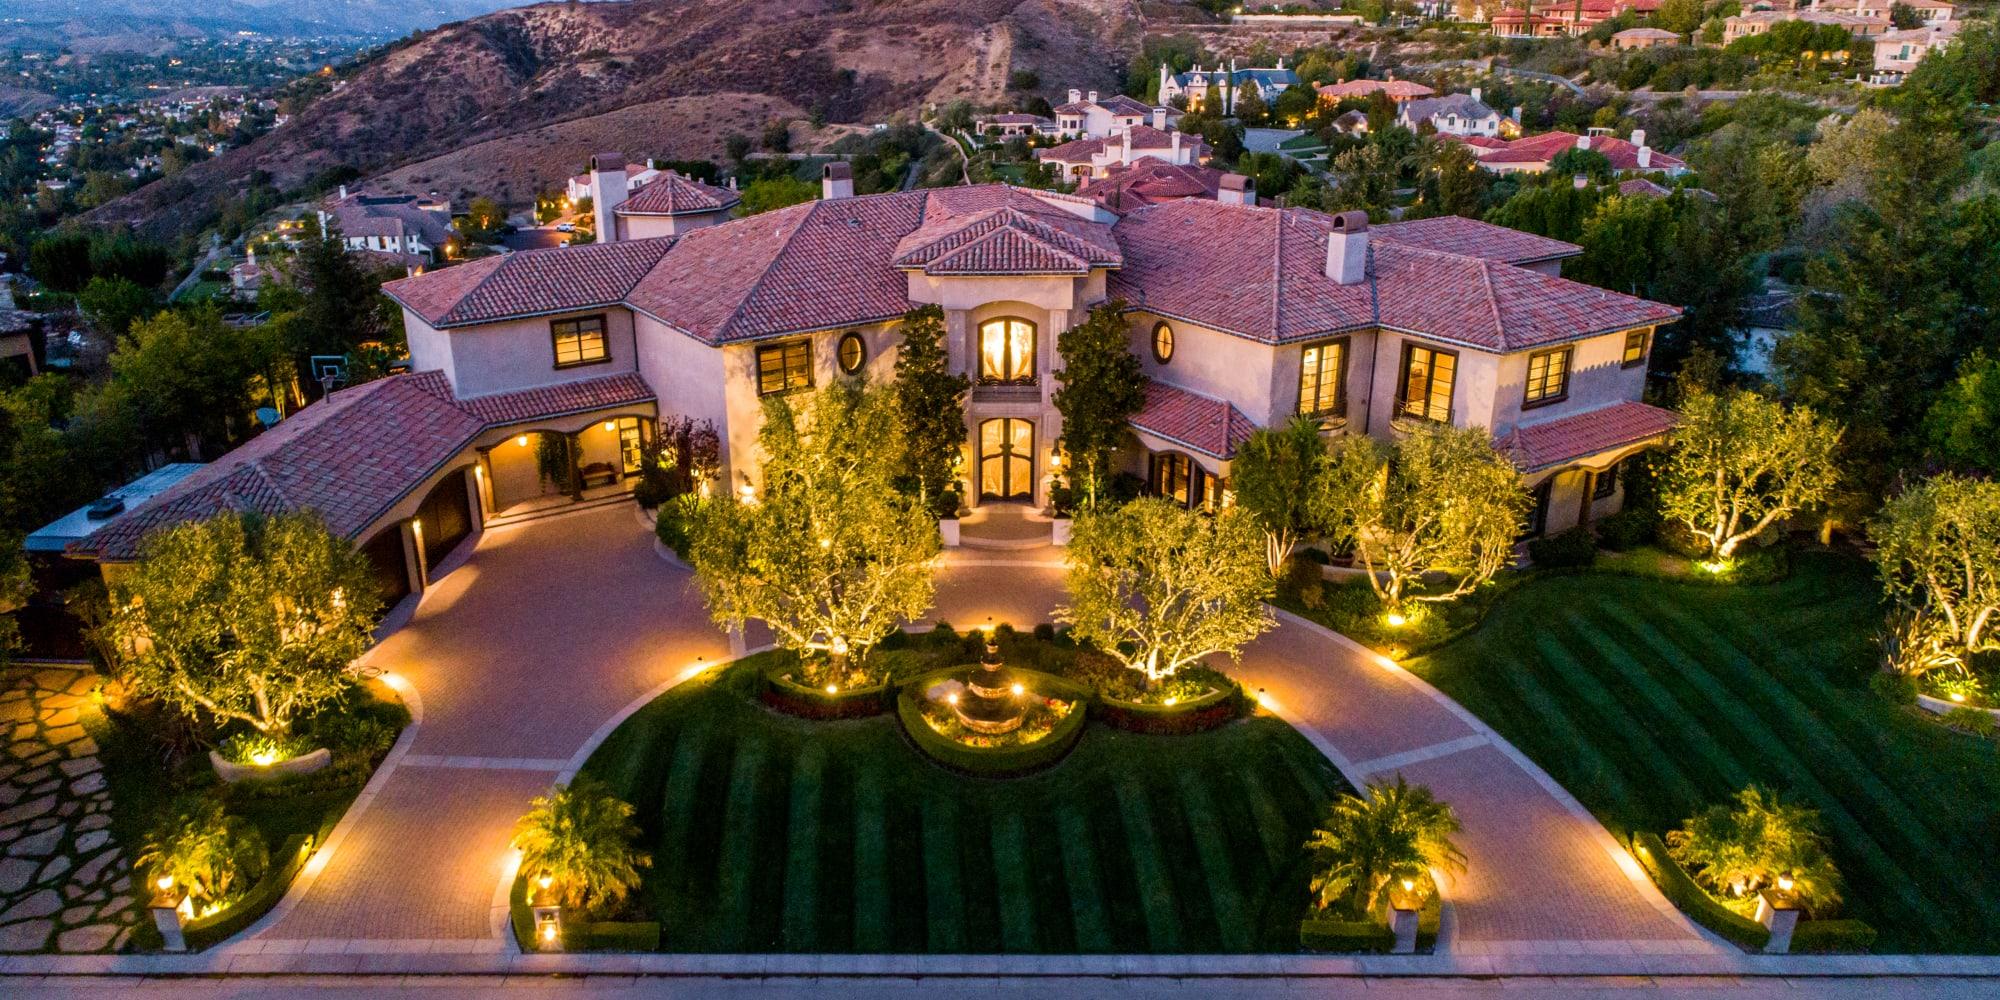 Enjoyable Dana Jeff Luxury Homes Calabasas Real Estate Team Download Free Architecture Designs Sospemadebymaigaardcom